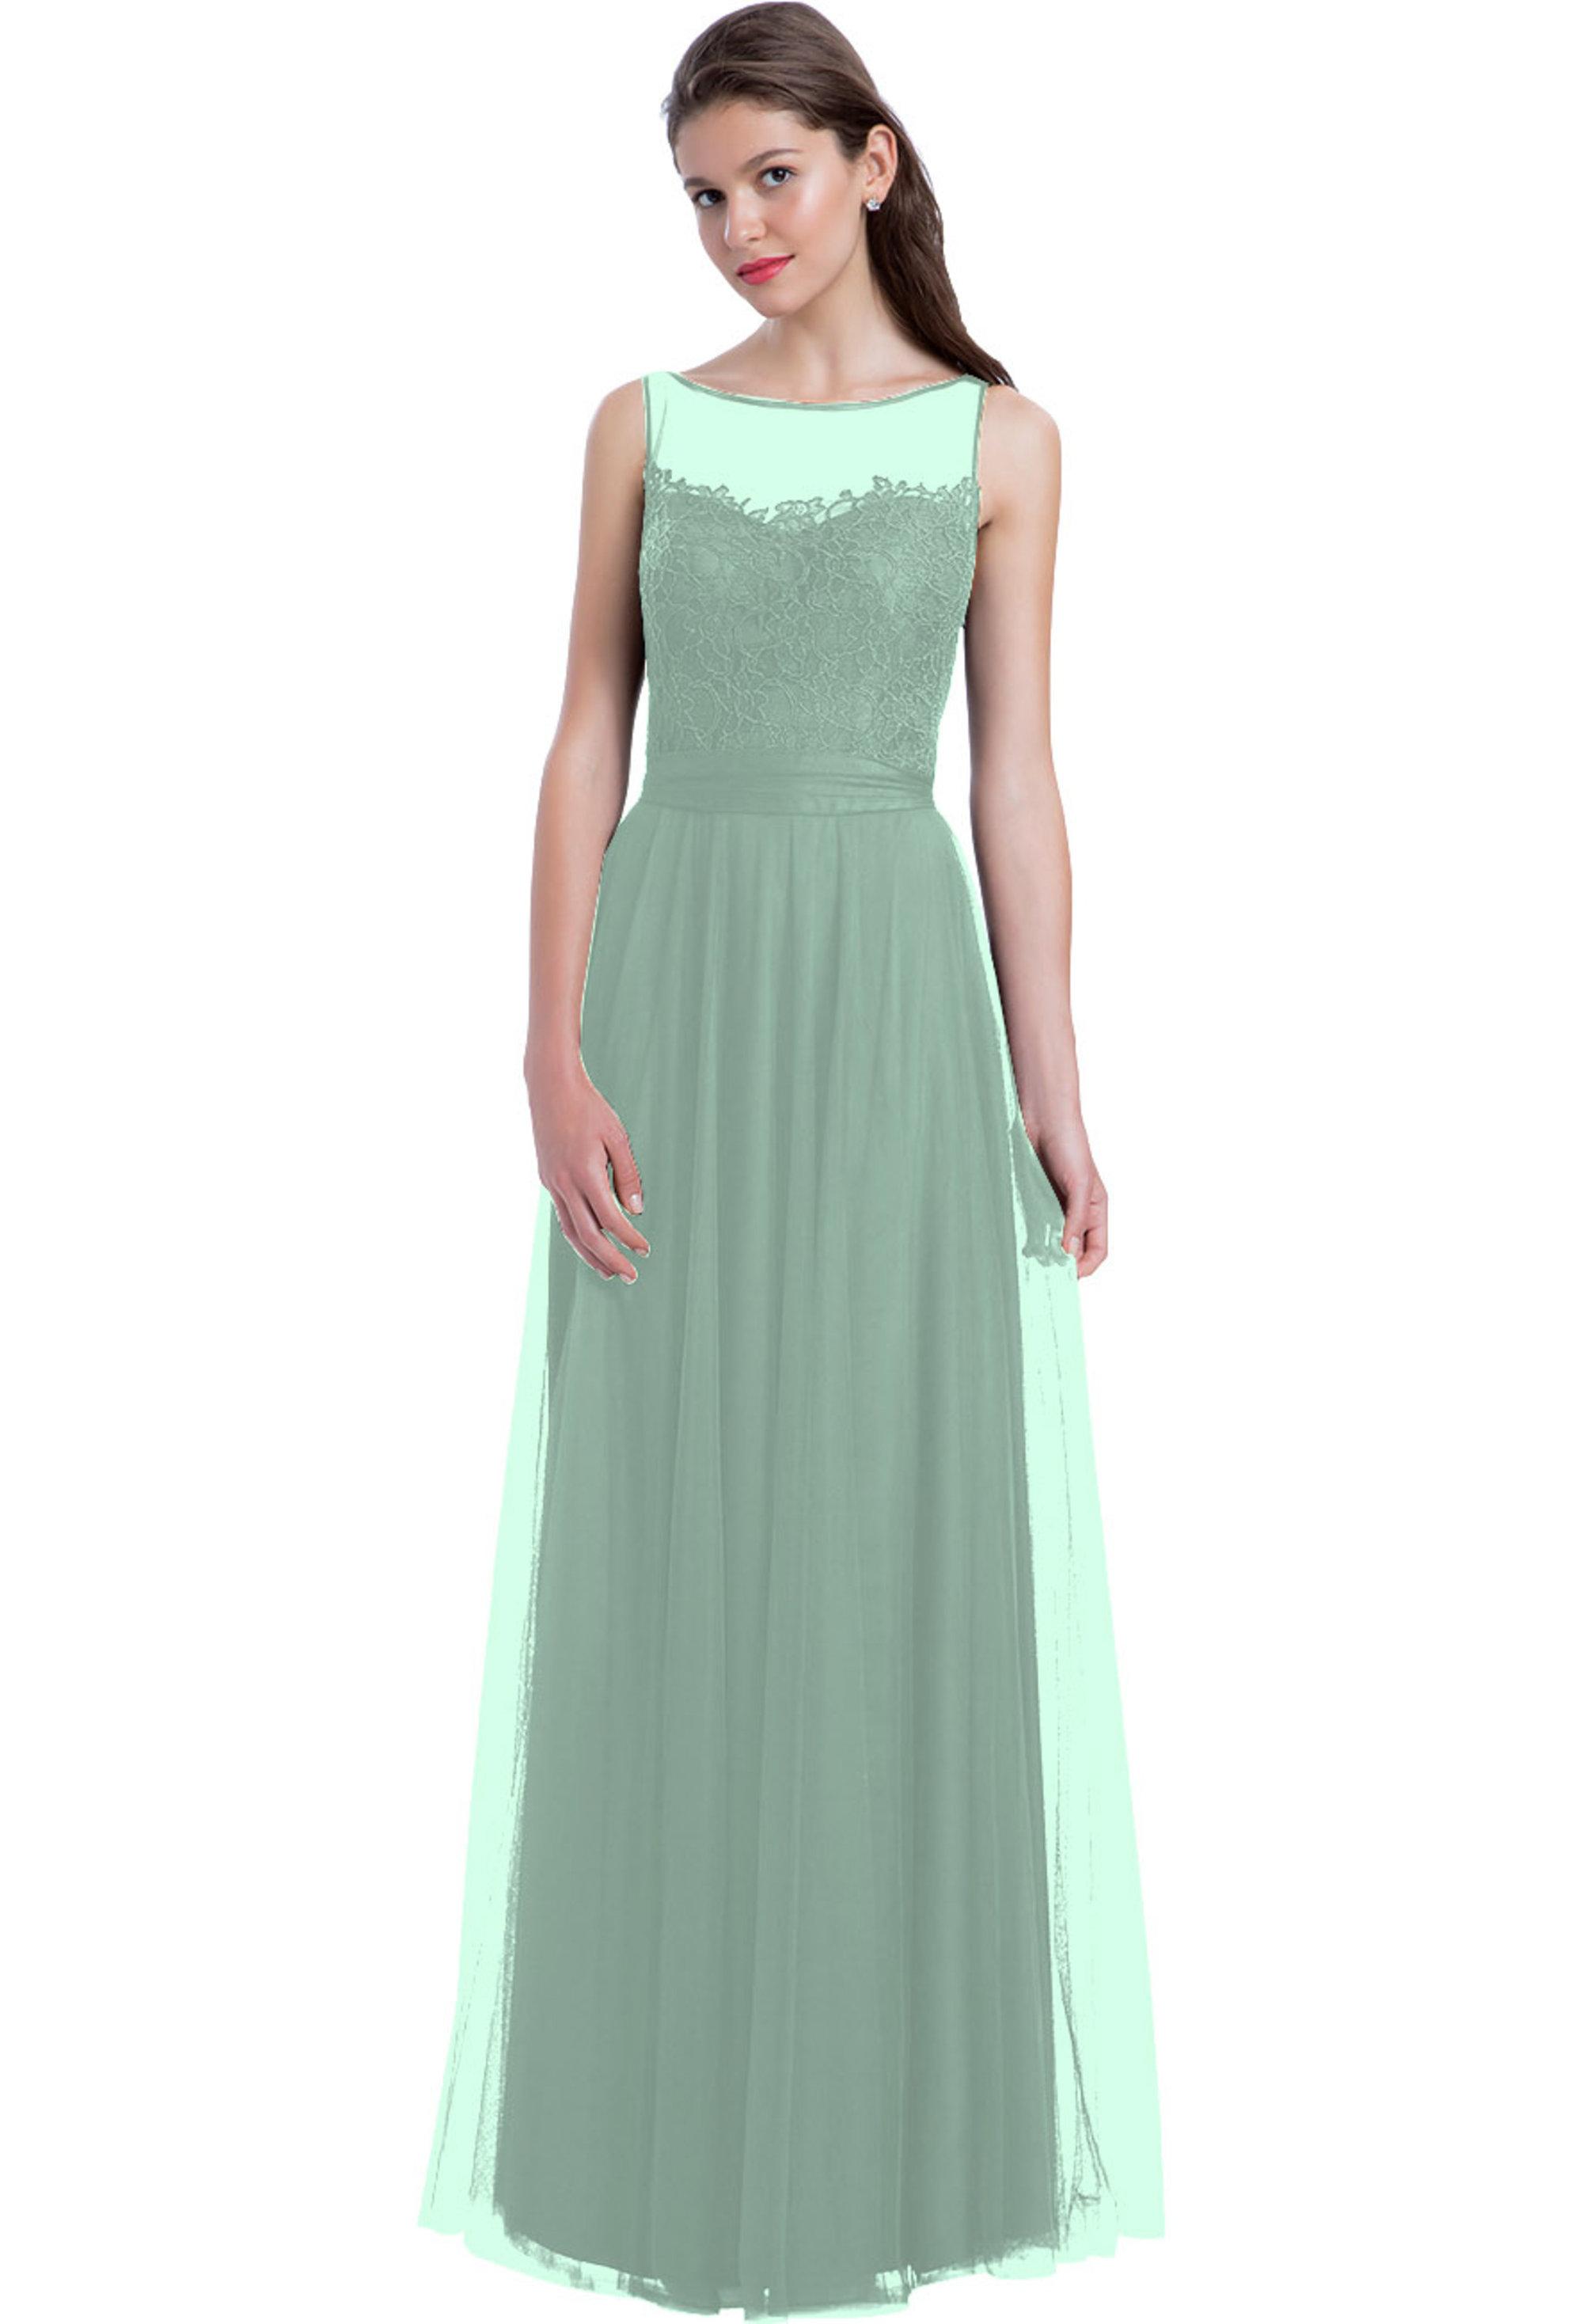 Bill Levkoff MINT English Netting Bateau Neckline A-line gown, $230.00 Front